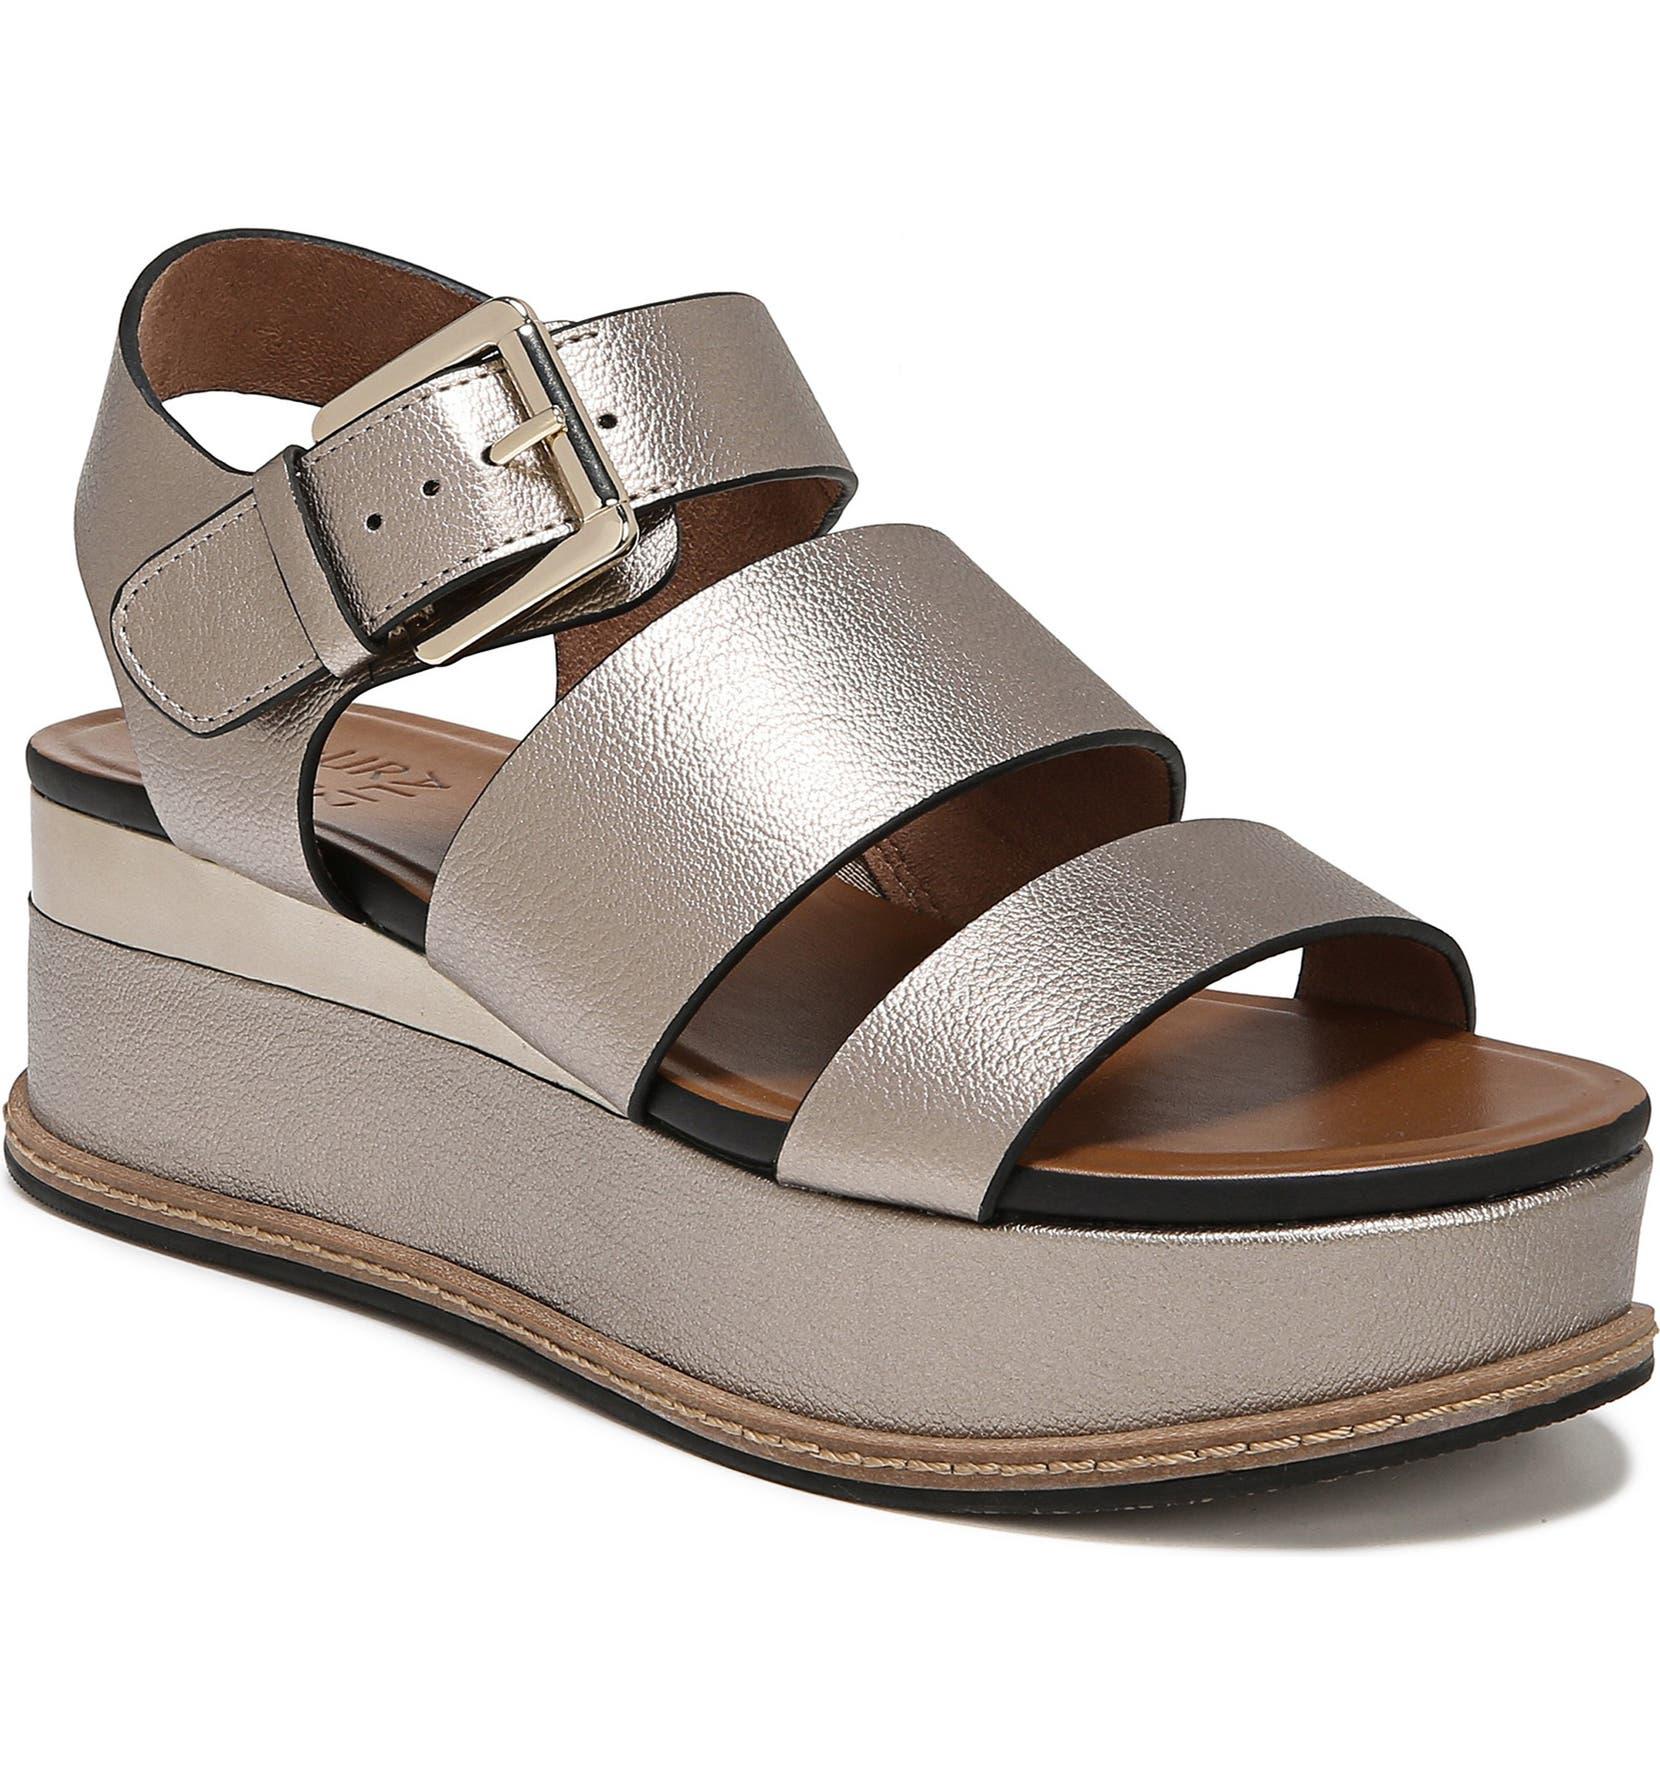 2b04f4cd661 Naturalizer Billie Platform Sandal (Women)